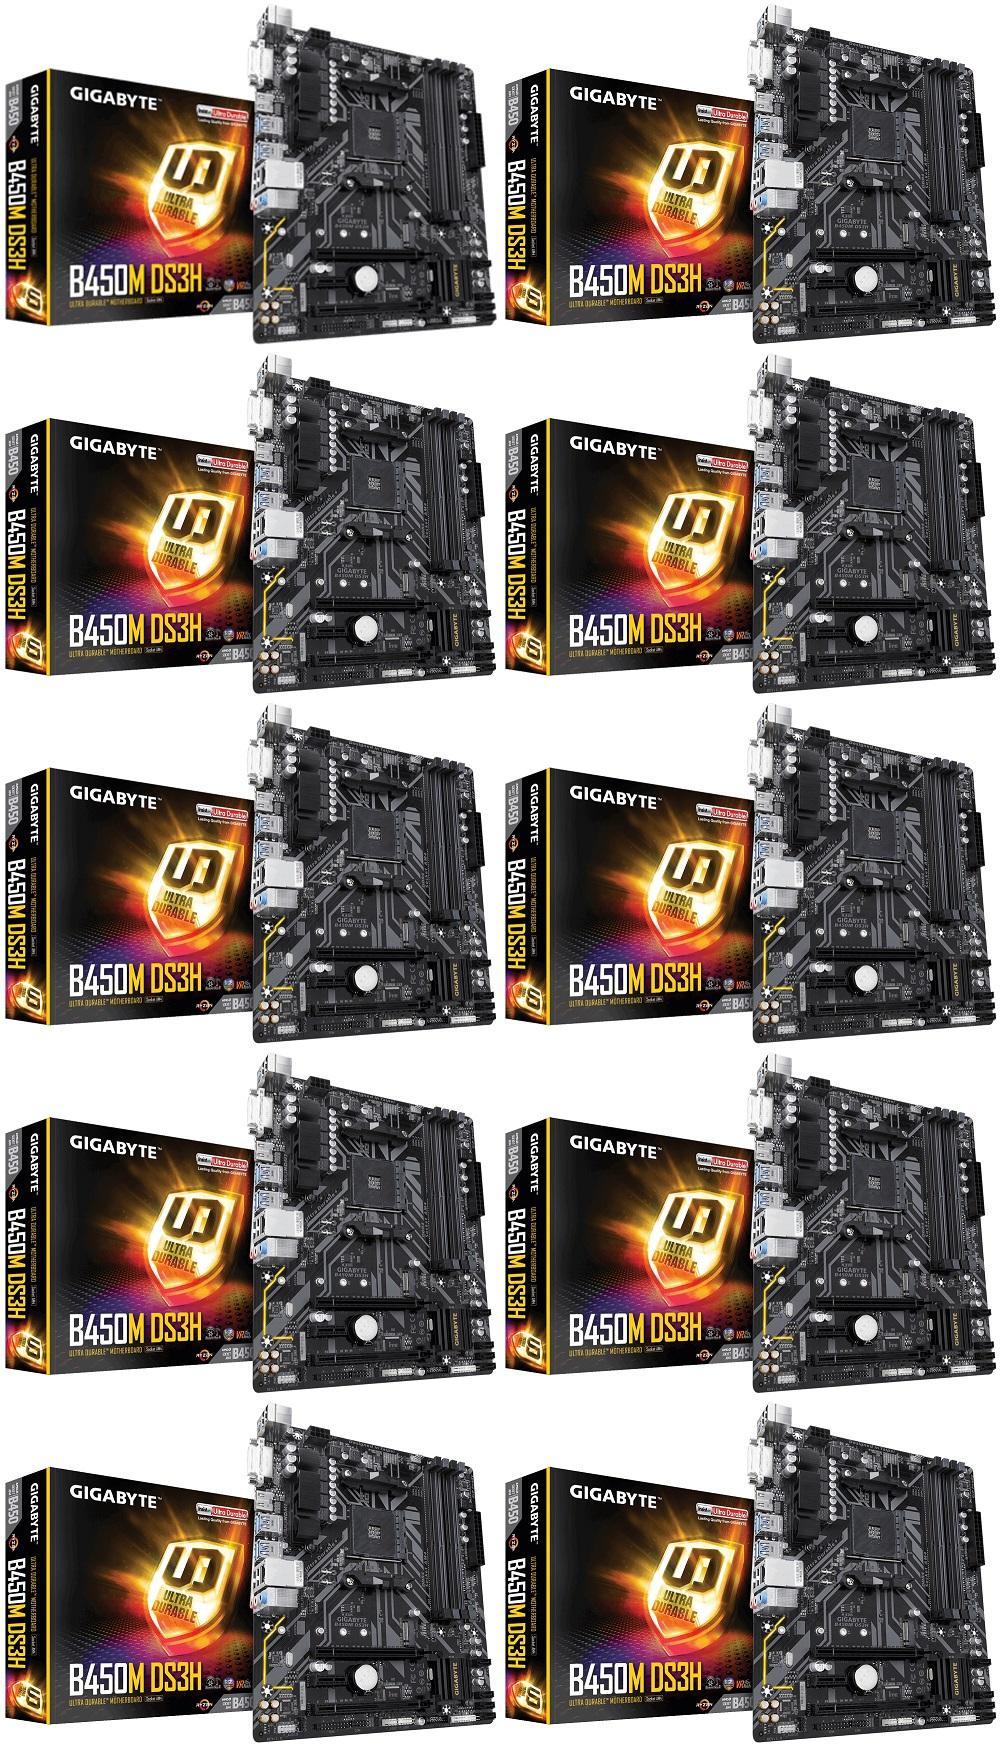 GIGABYTE B450M DS3H DDR4/AMD Ryzen AM4/B450/Micro ATX MOTHERBOARD